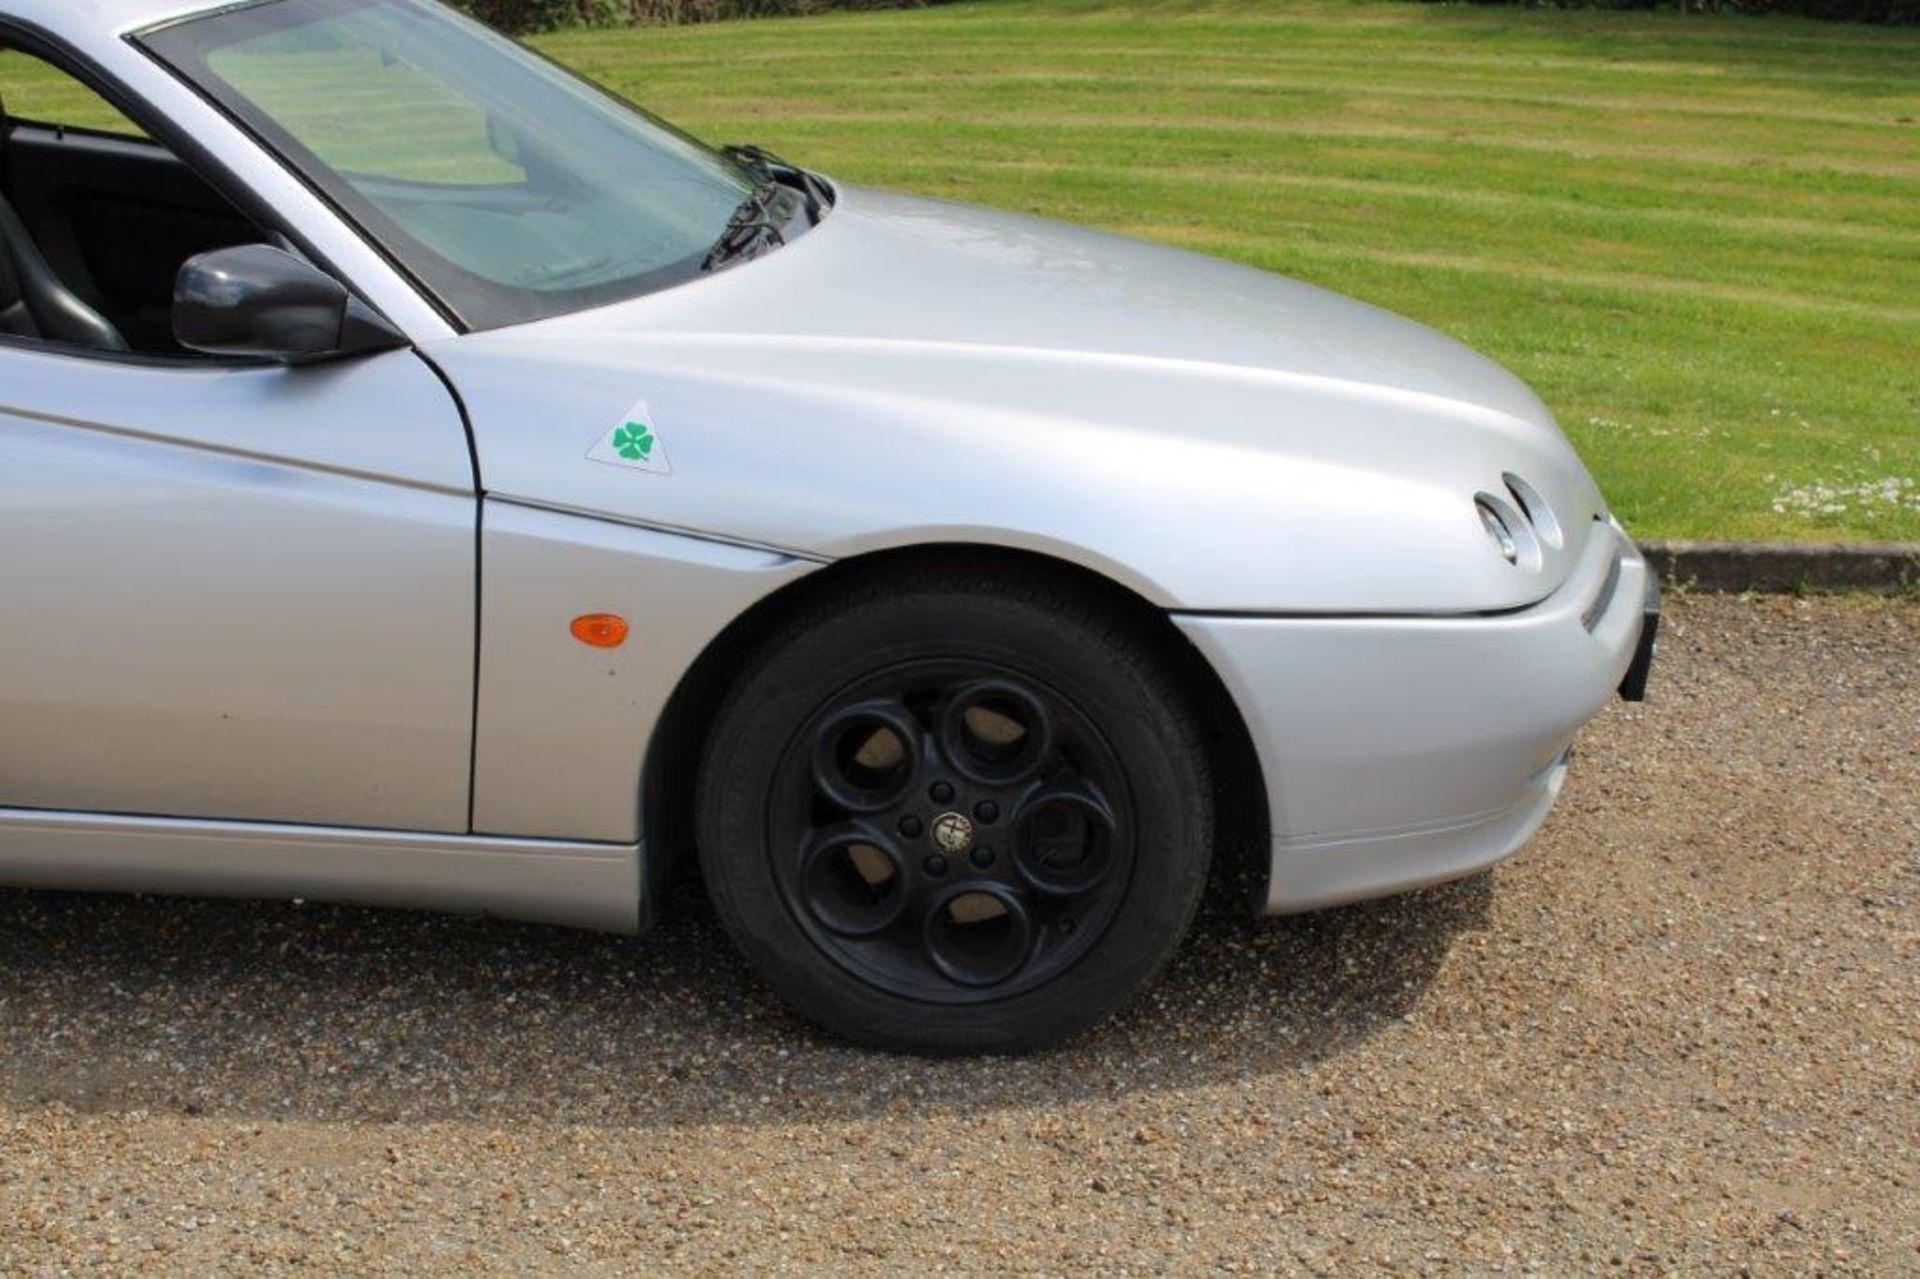 1999 Alfa Romeo GTV Lusso T-Spark 16v - Image 2 of 18